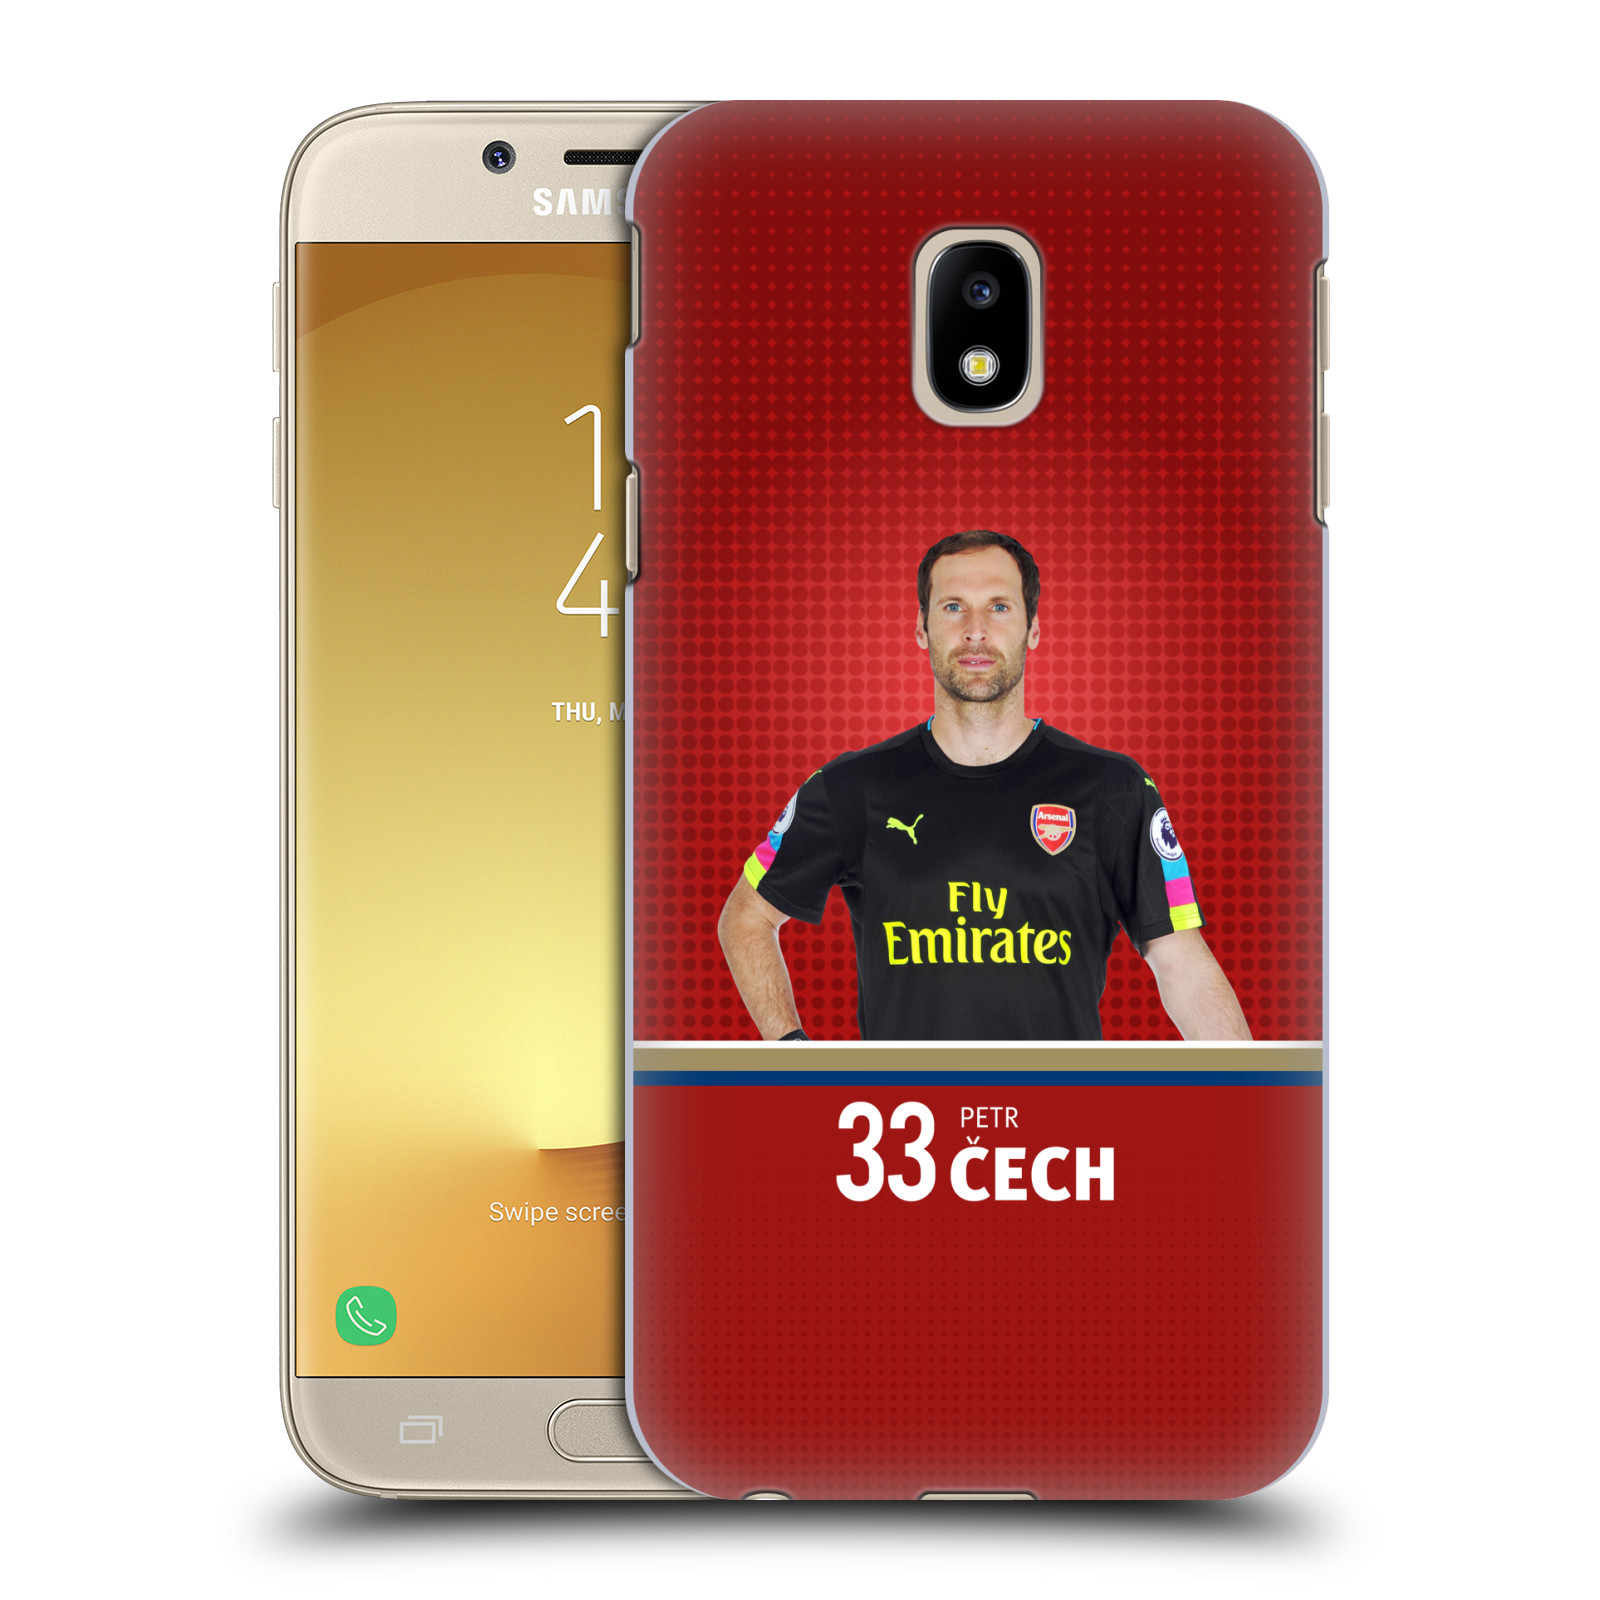 Plastové pouzdro na mobil Samsung Galaxy J3 (2017) - Head Case - Arsenal FC - Petr Čech